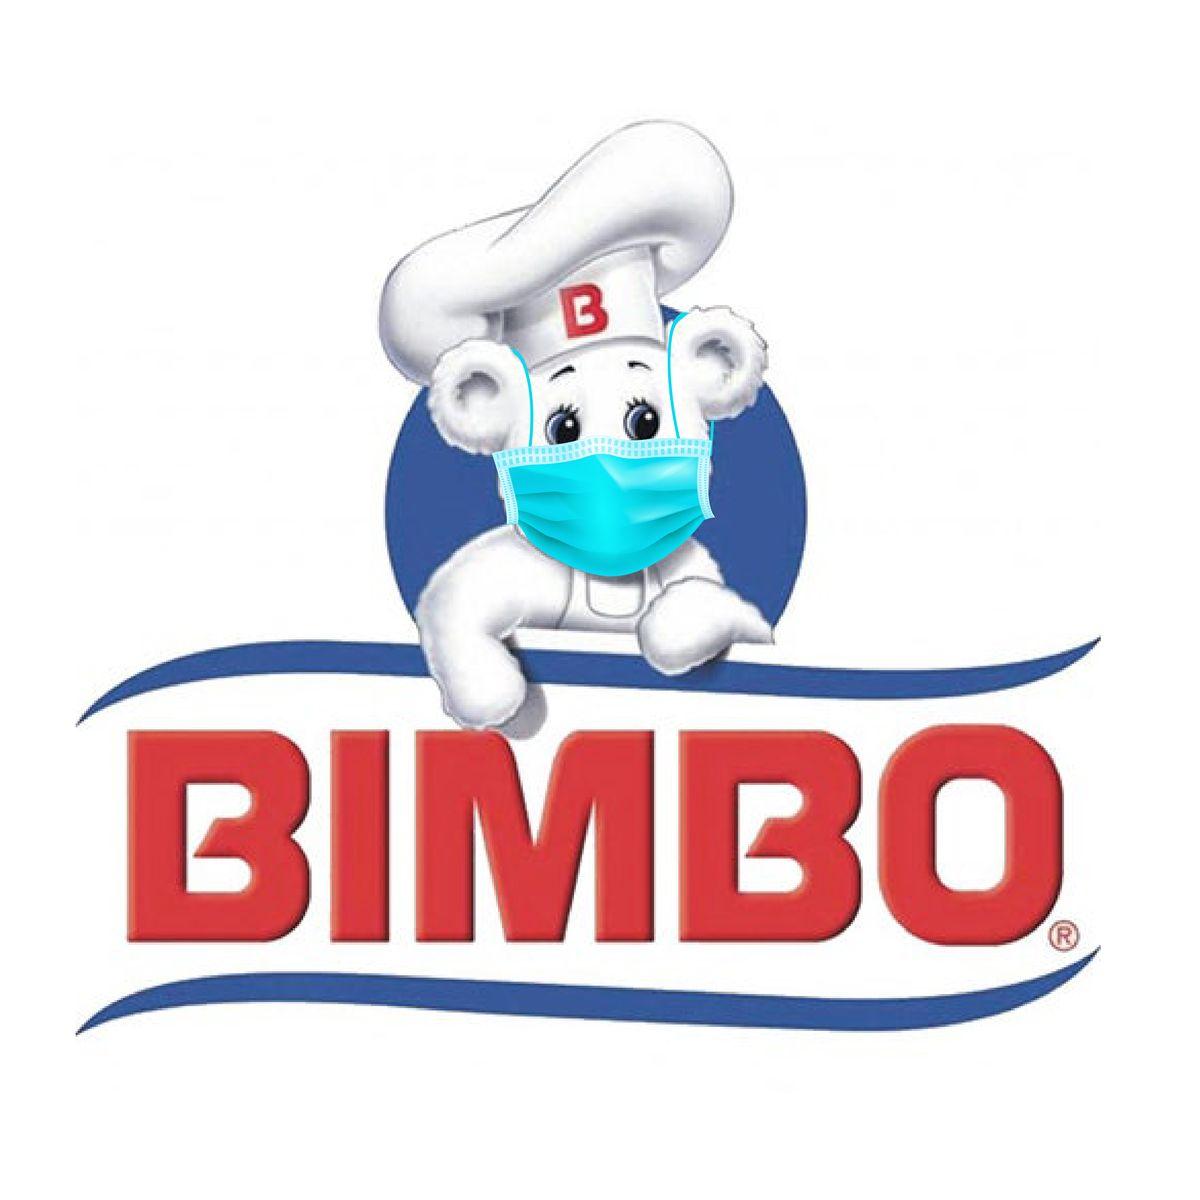 Osito Bimbo